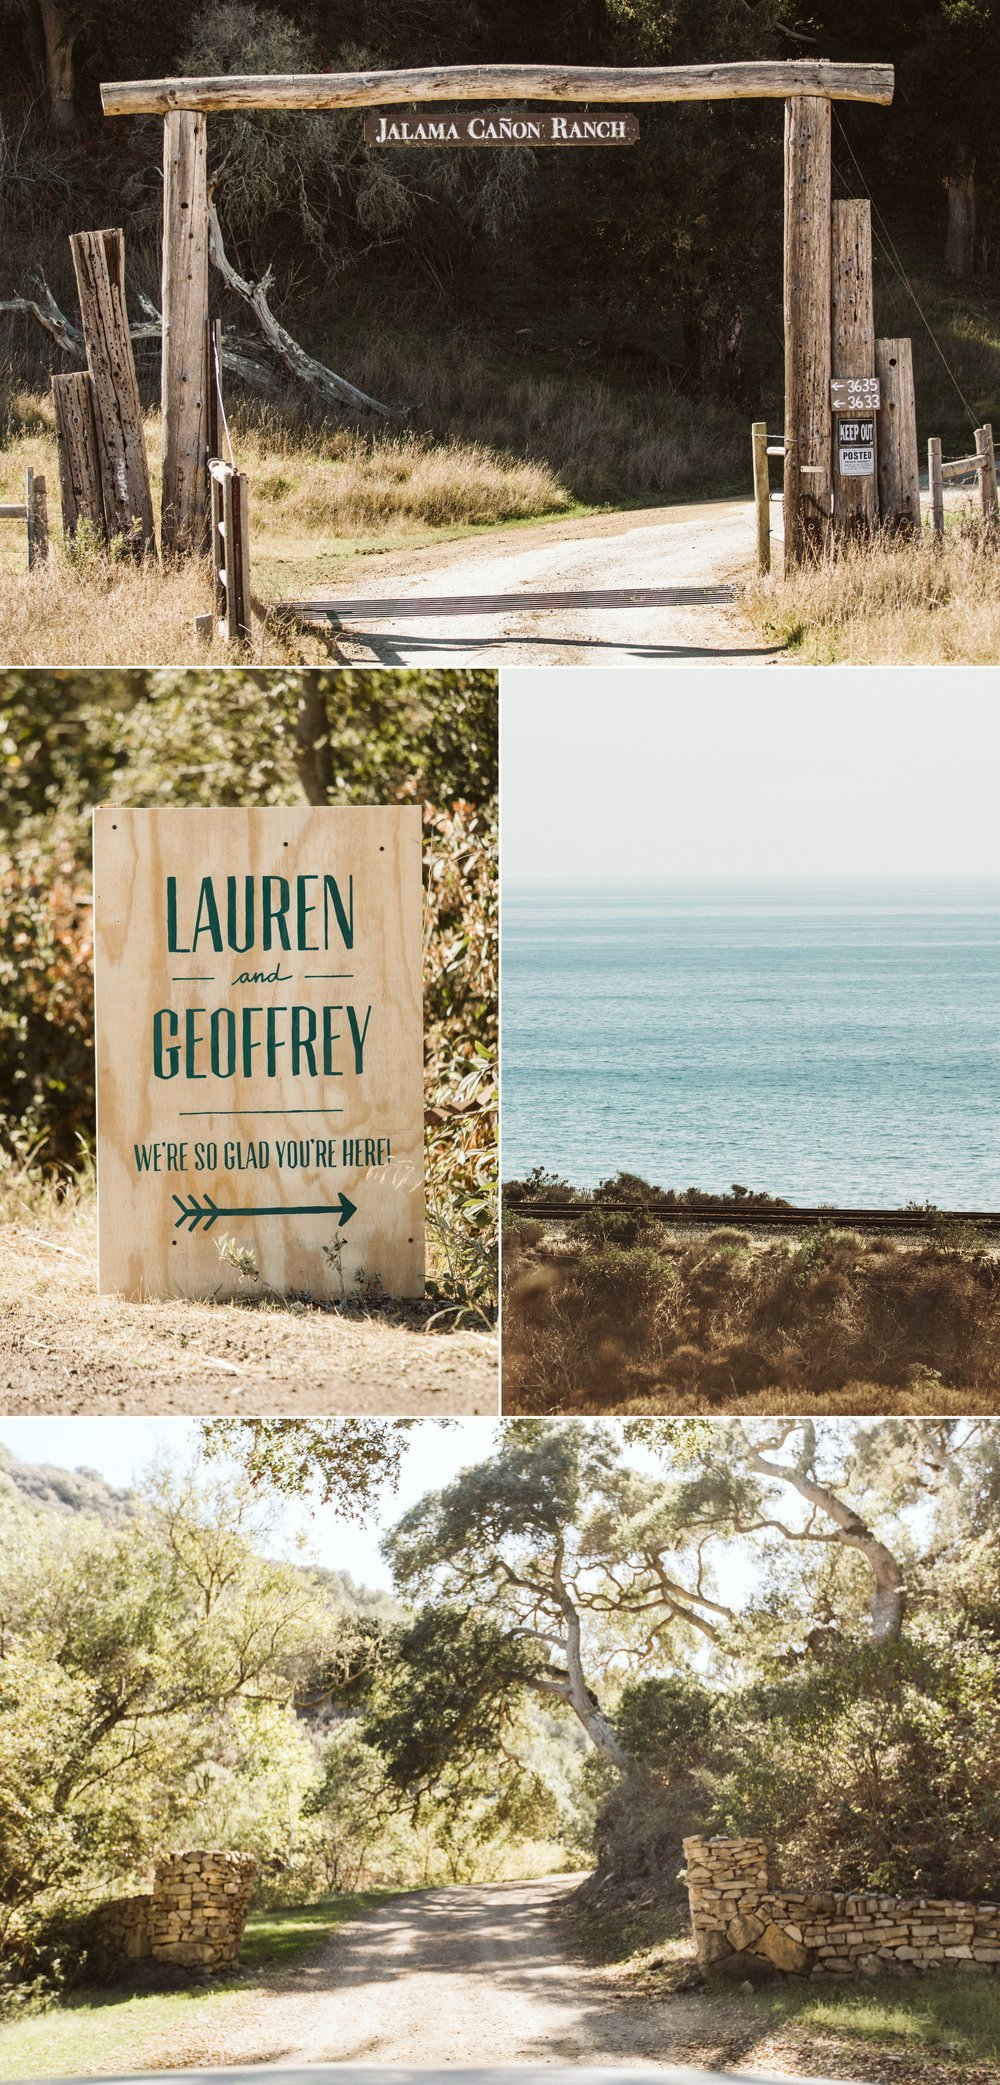 Colorful Barn Wedding at Jalama Canon Ranch- Lompoc- Santa Barbara- Geoff & Lauren 2.jpg